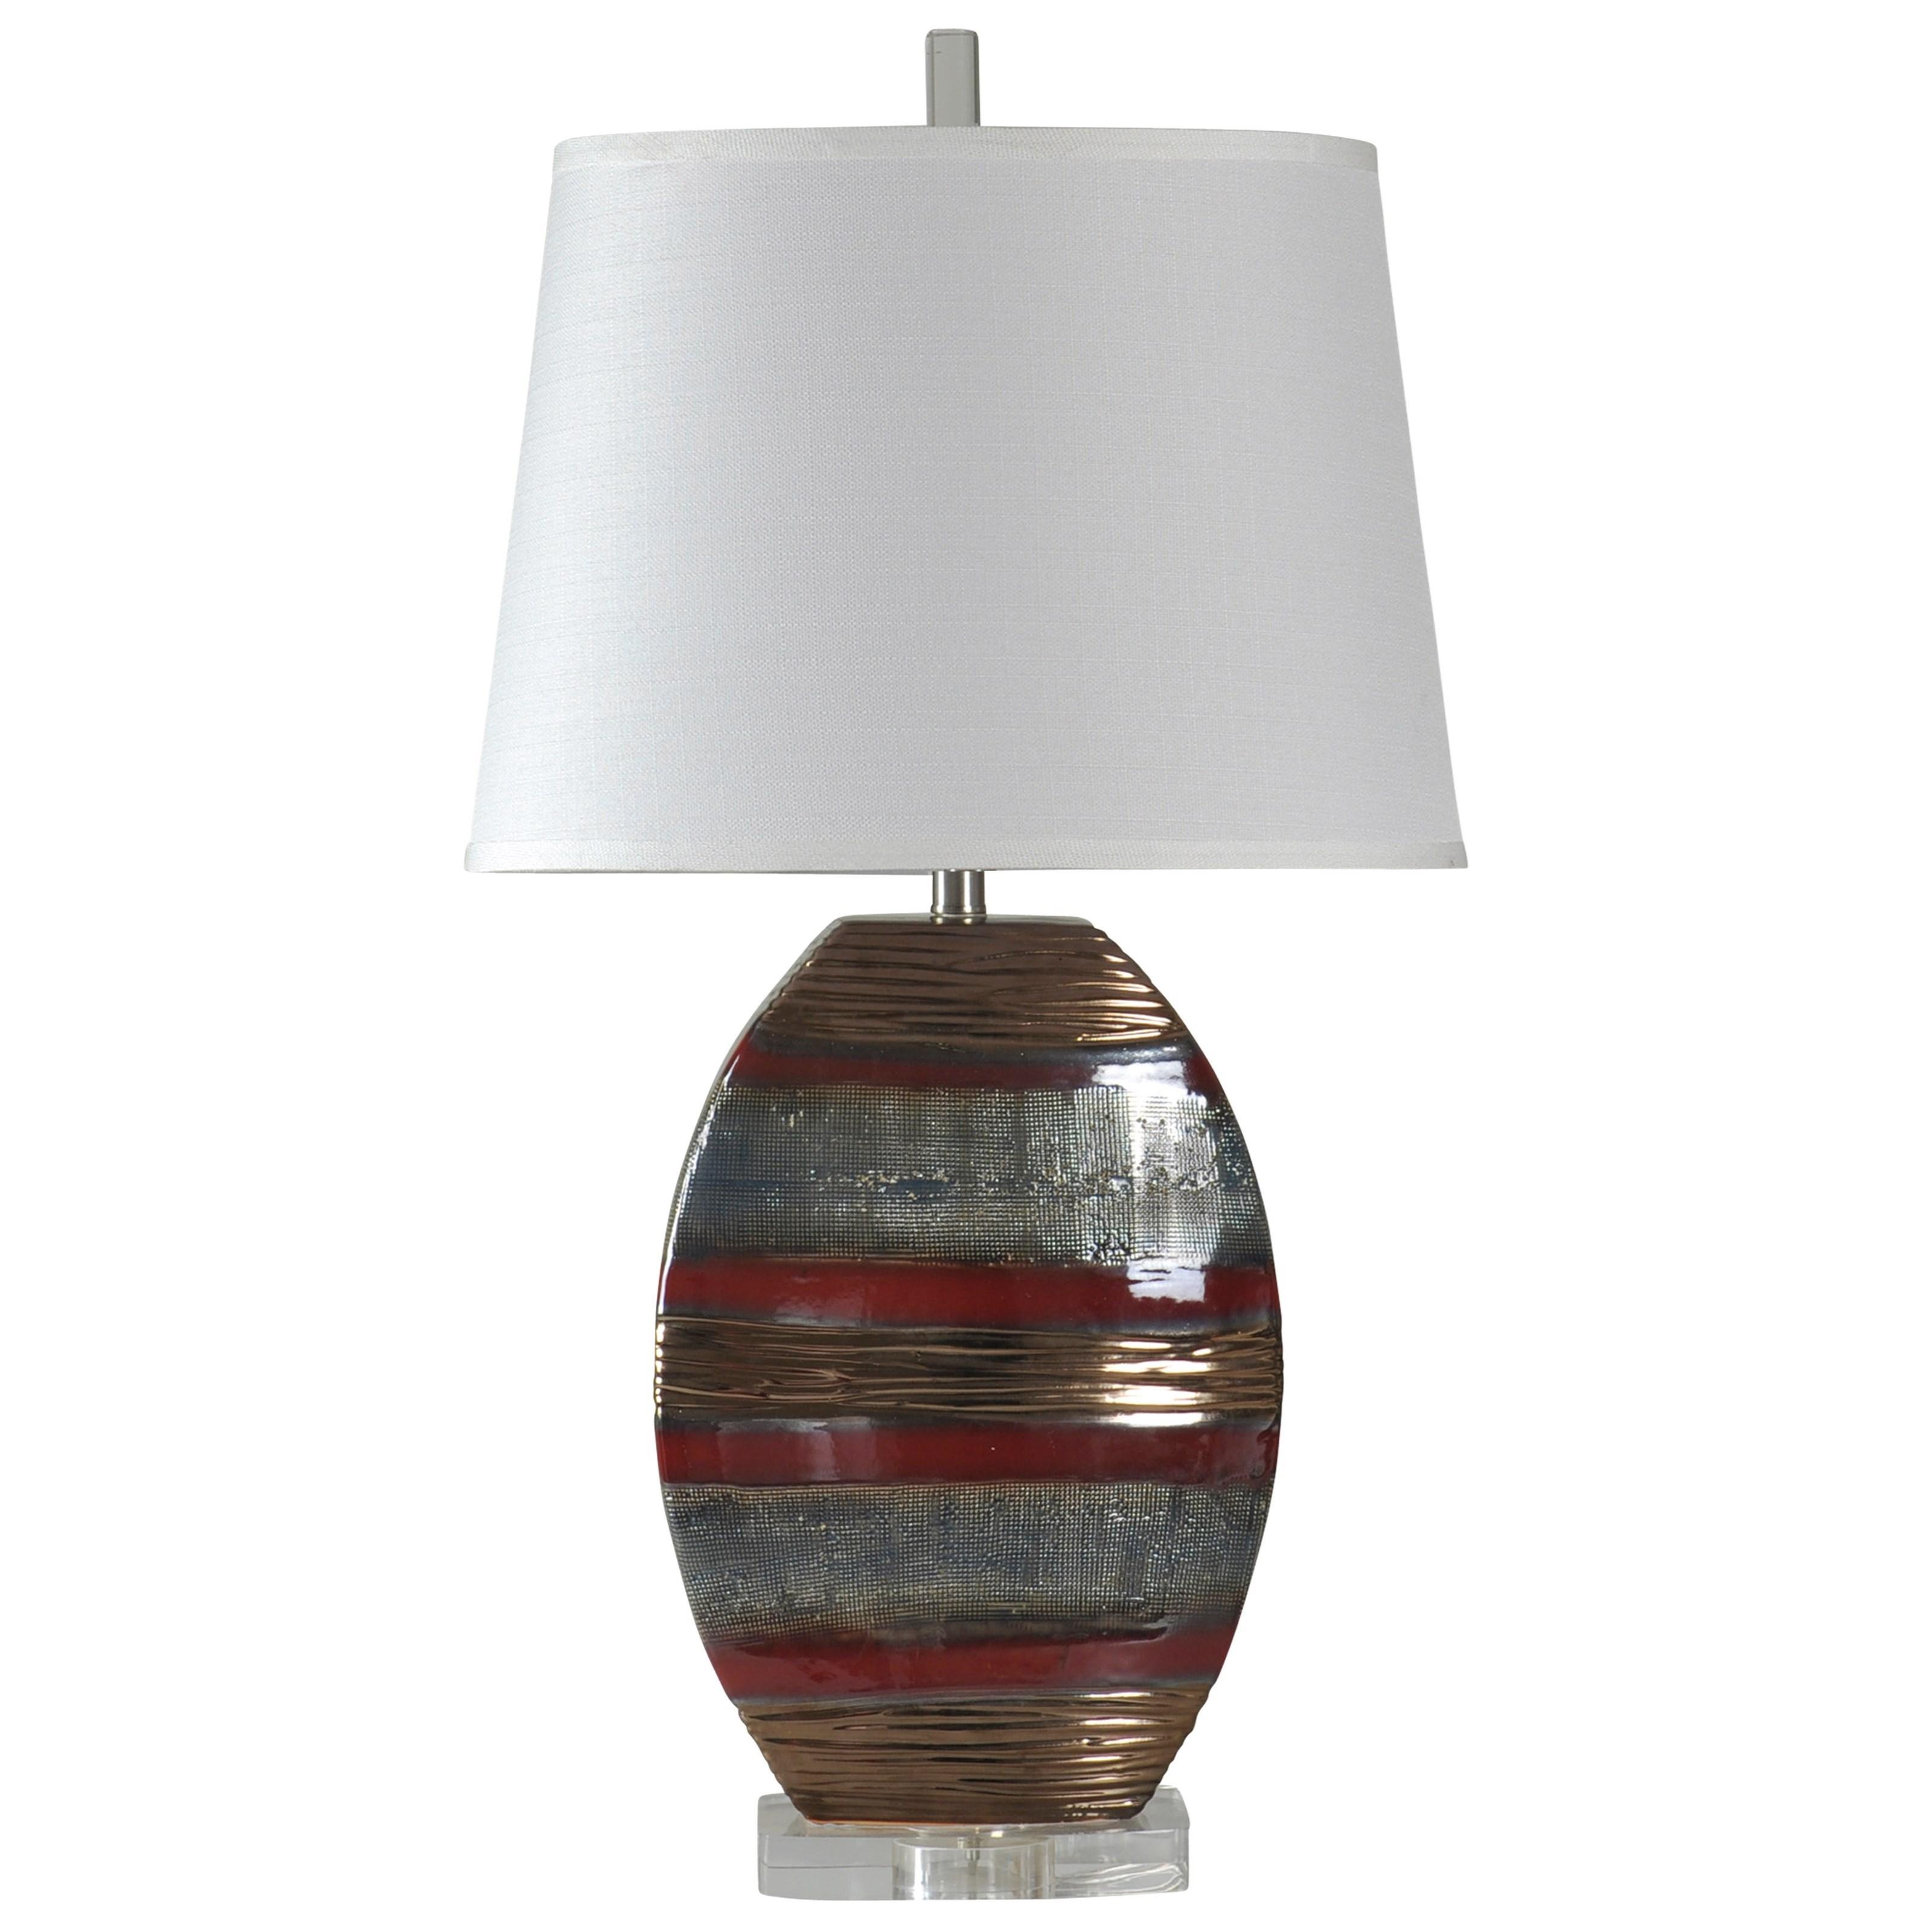 StyleCraft LampsEarth Tone Ceramic Lamp